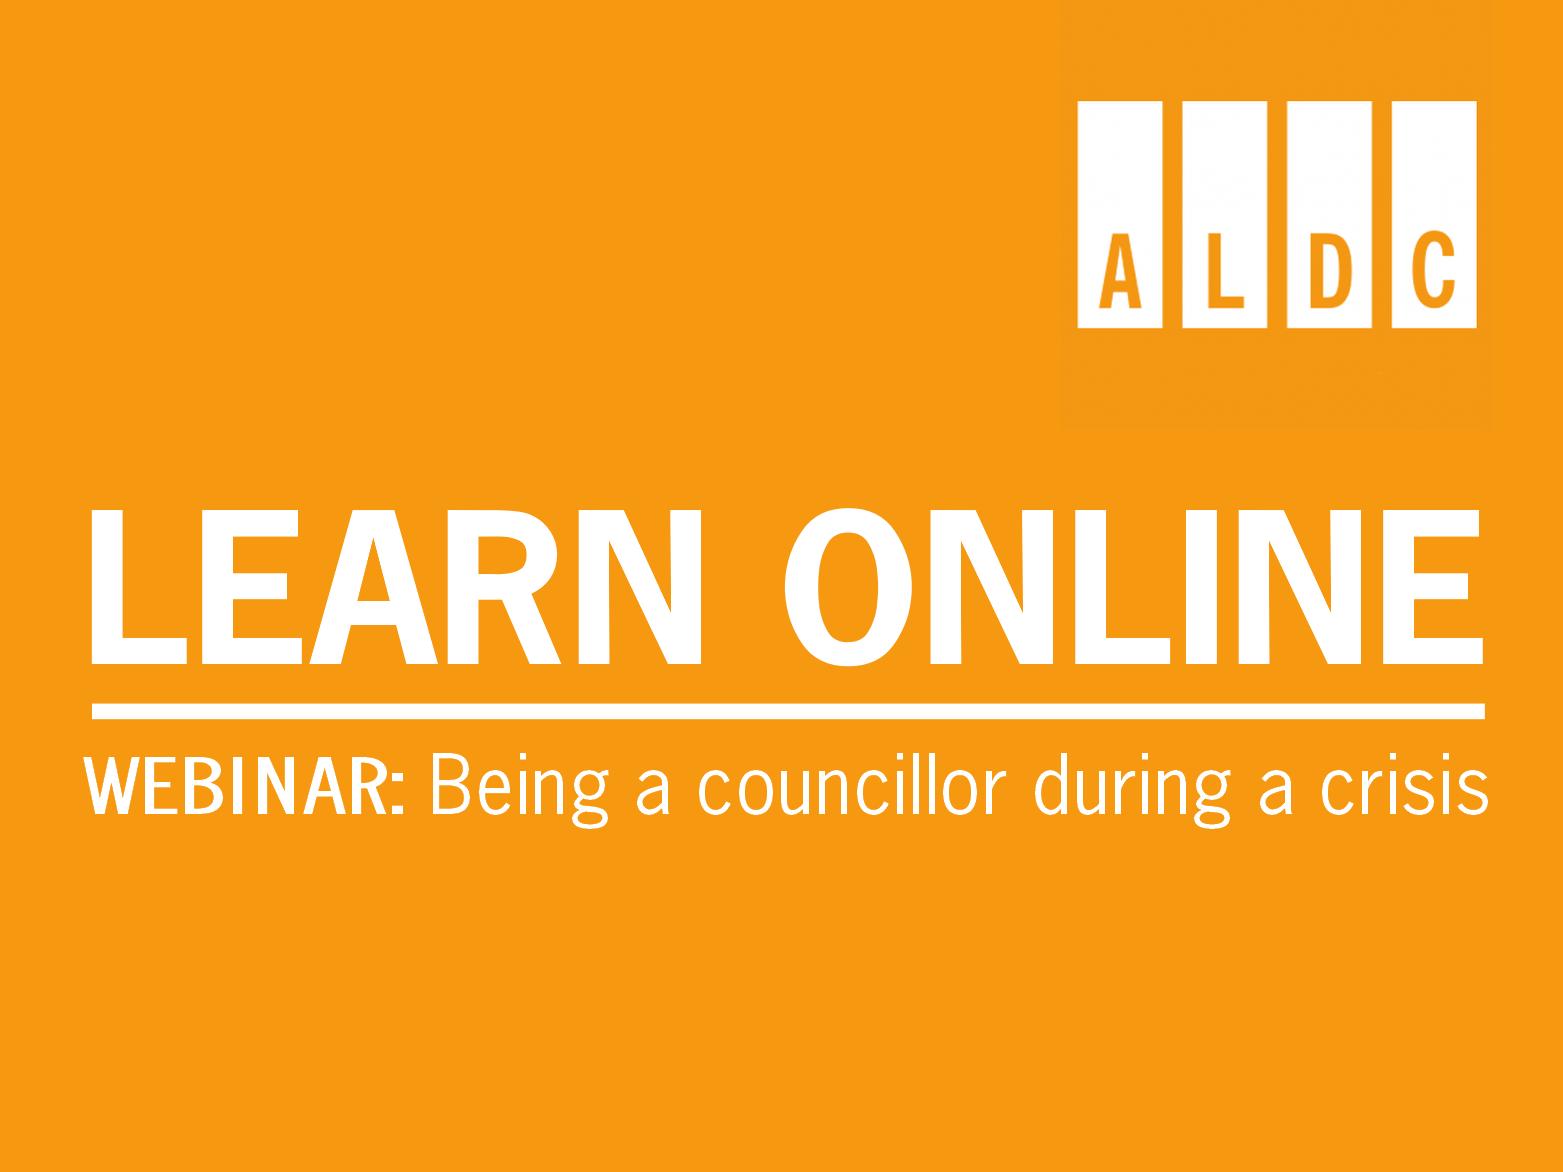 Webinar: How To Be a Councillor During a Crisis 15 April 2020